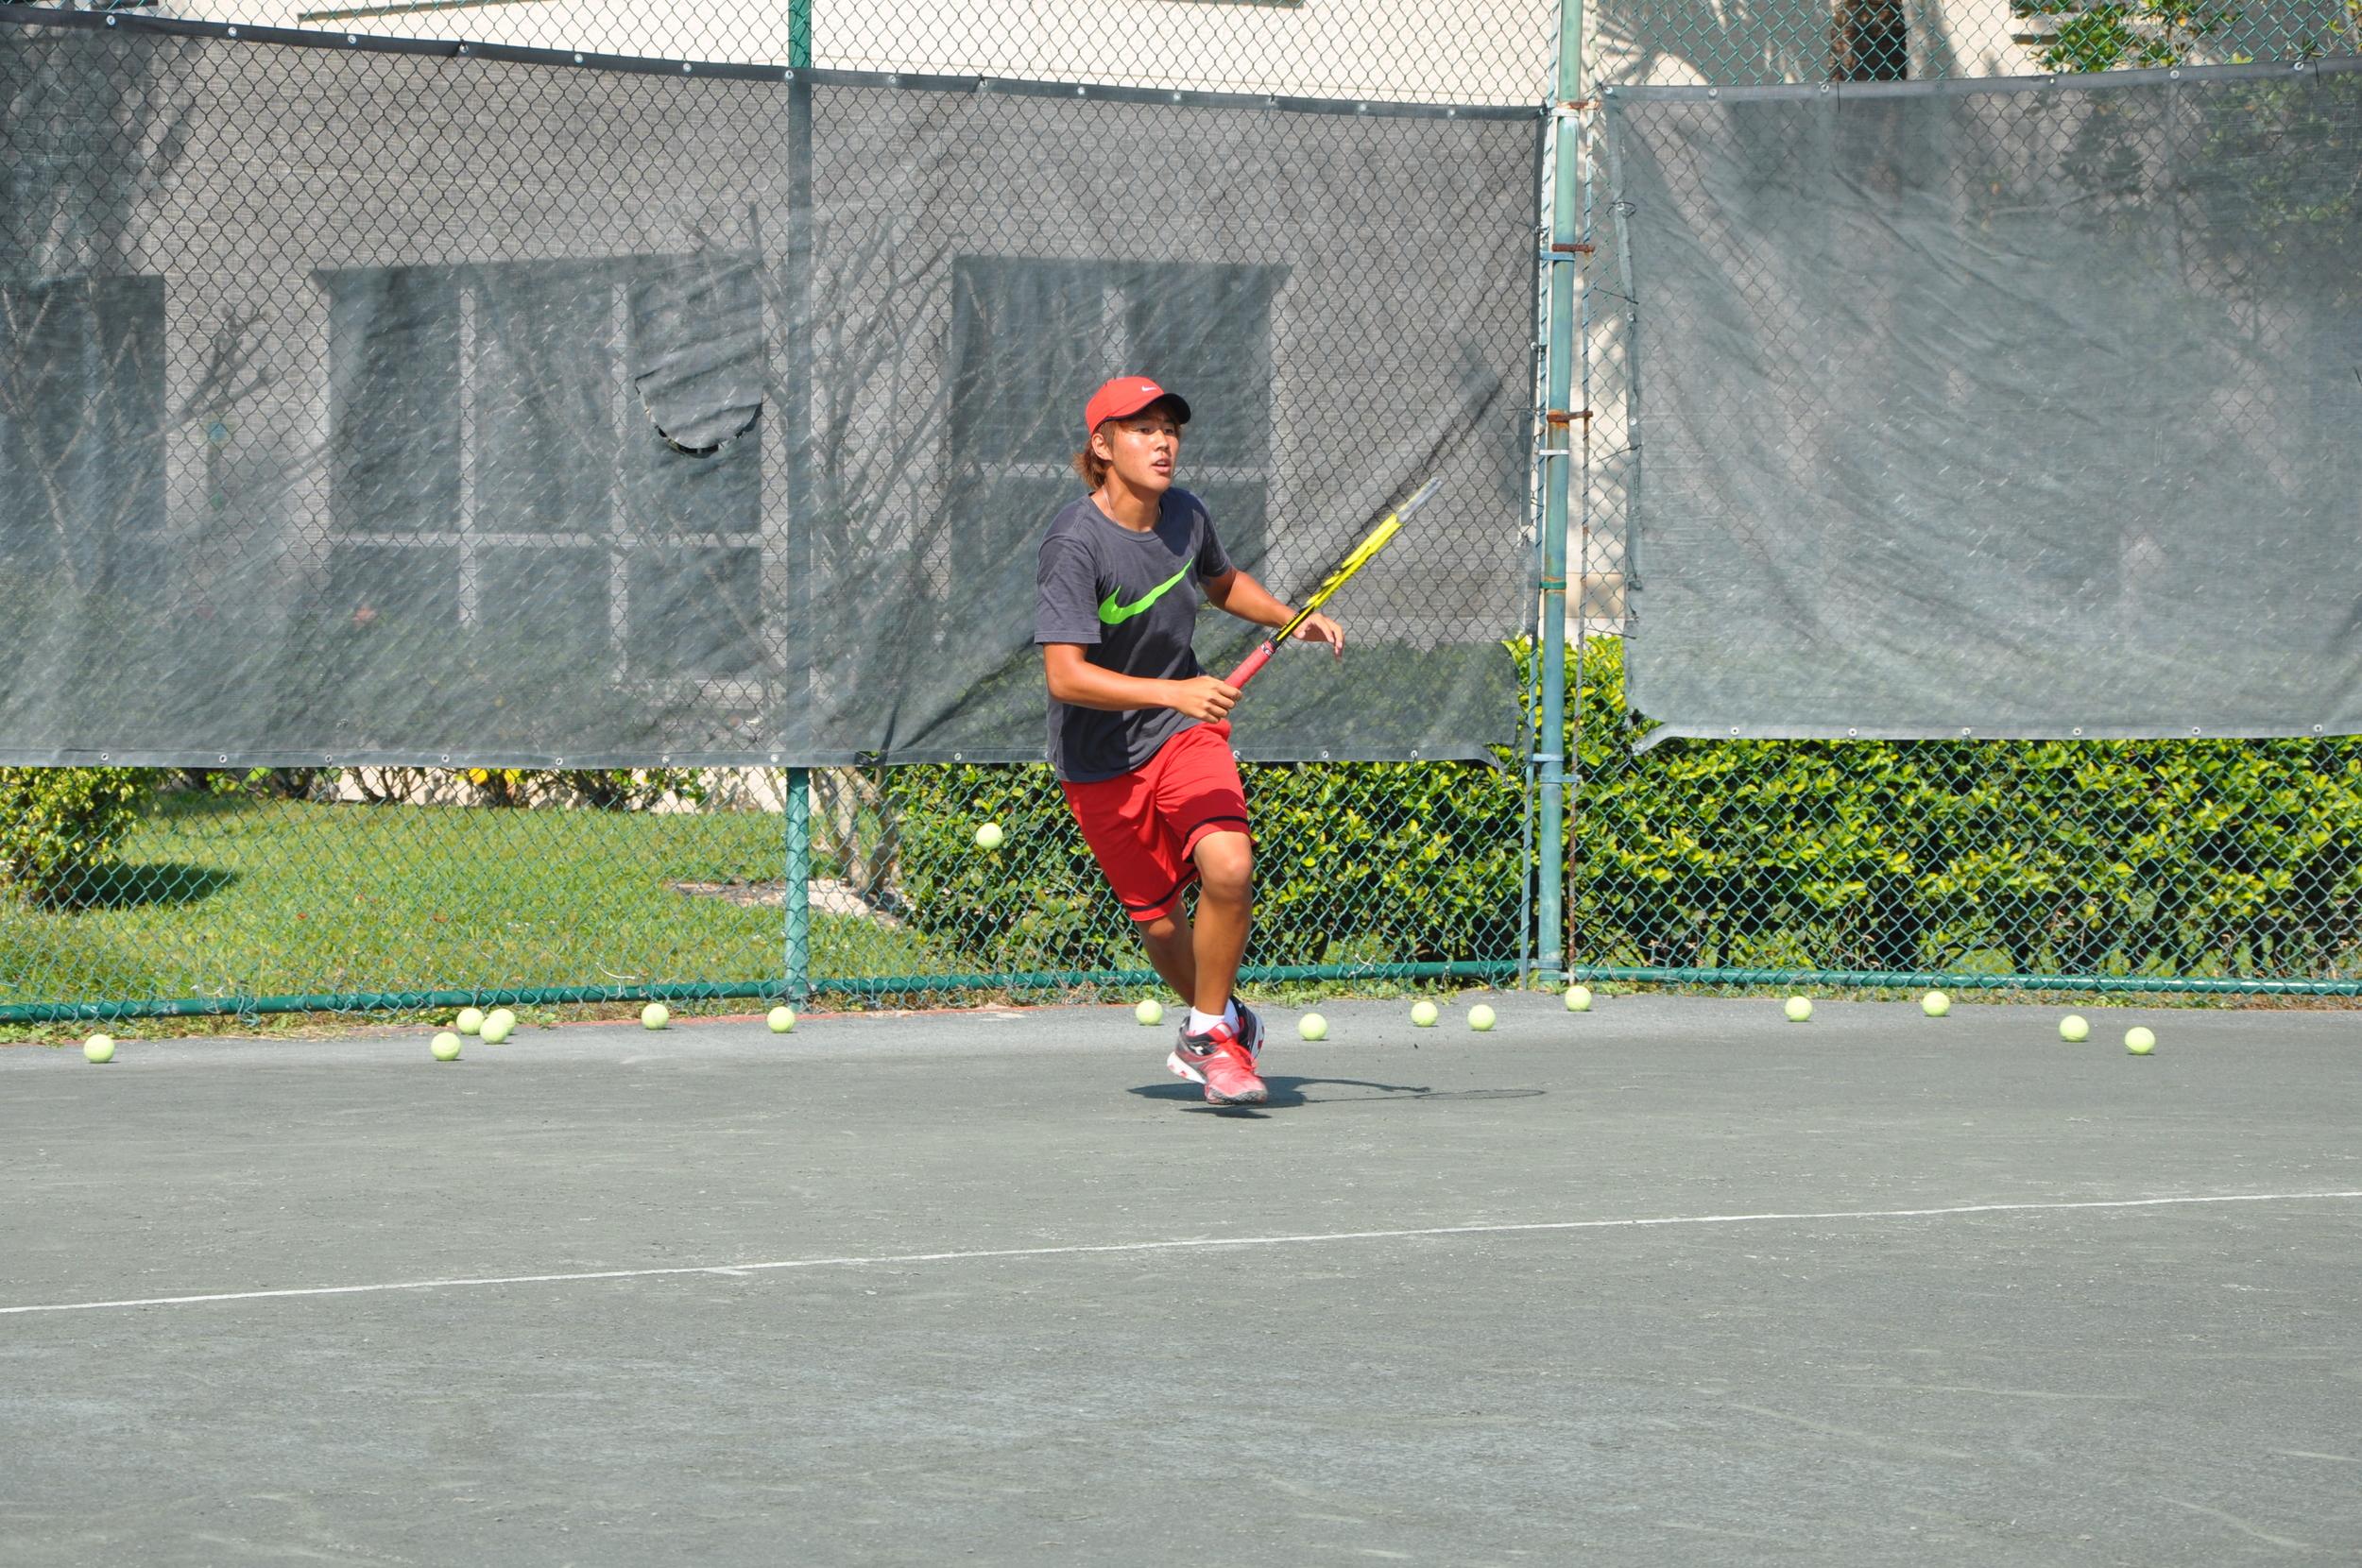 gomez-tennis-academy-training-forehand.JPG